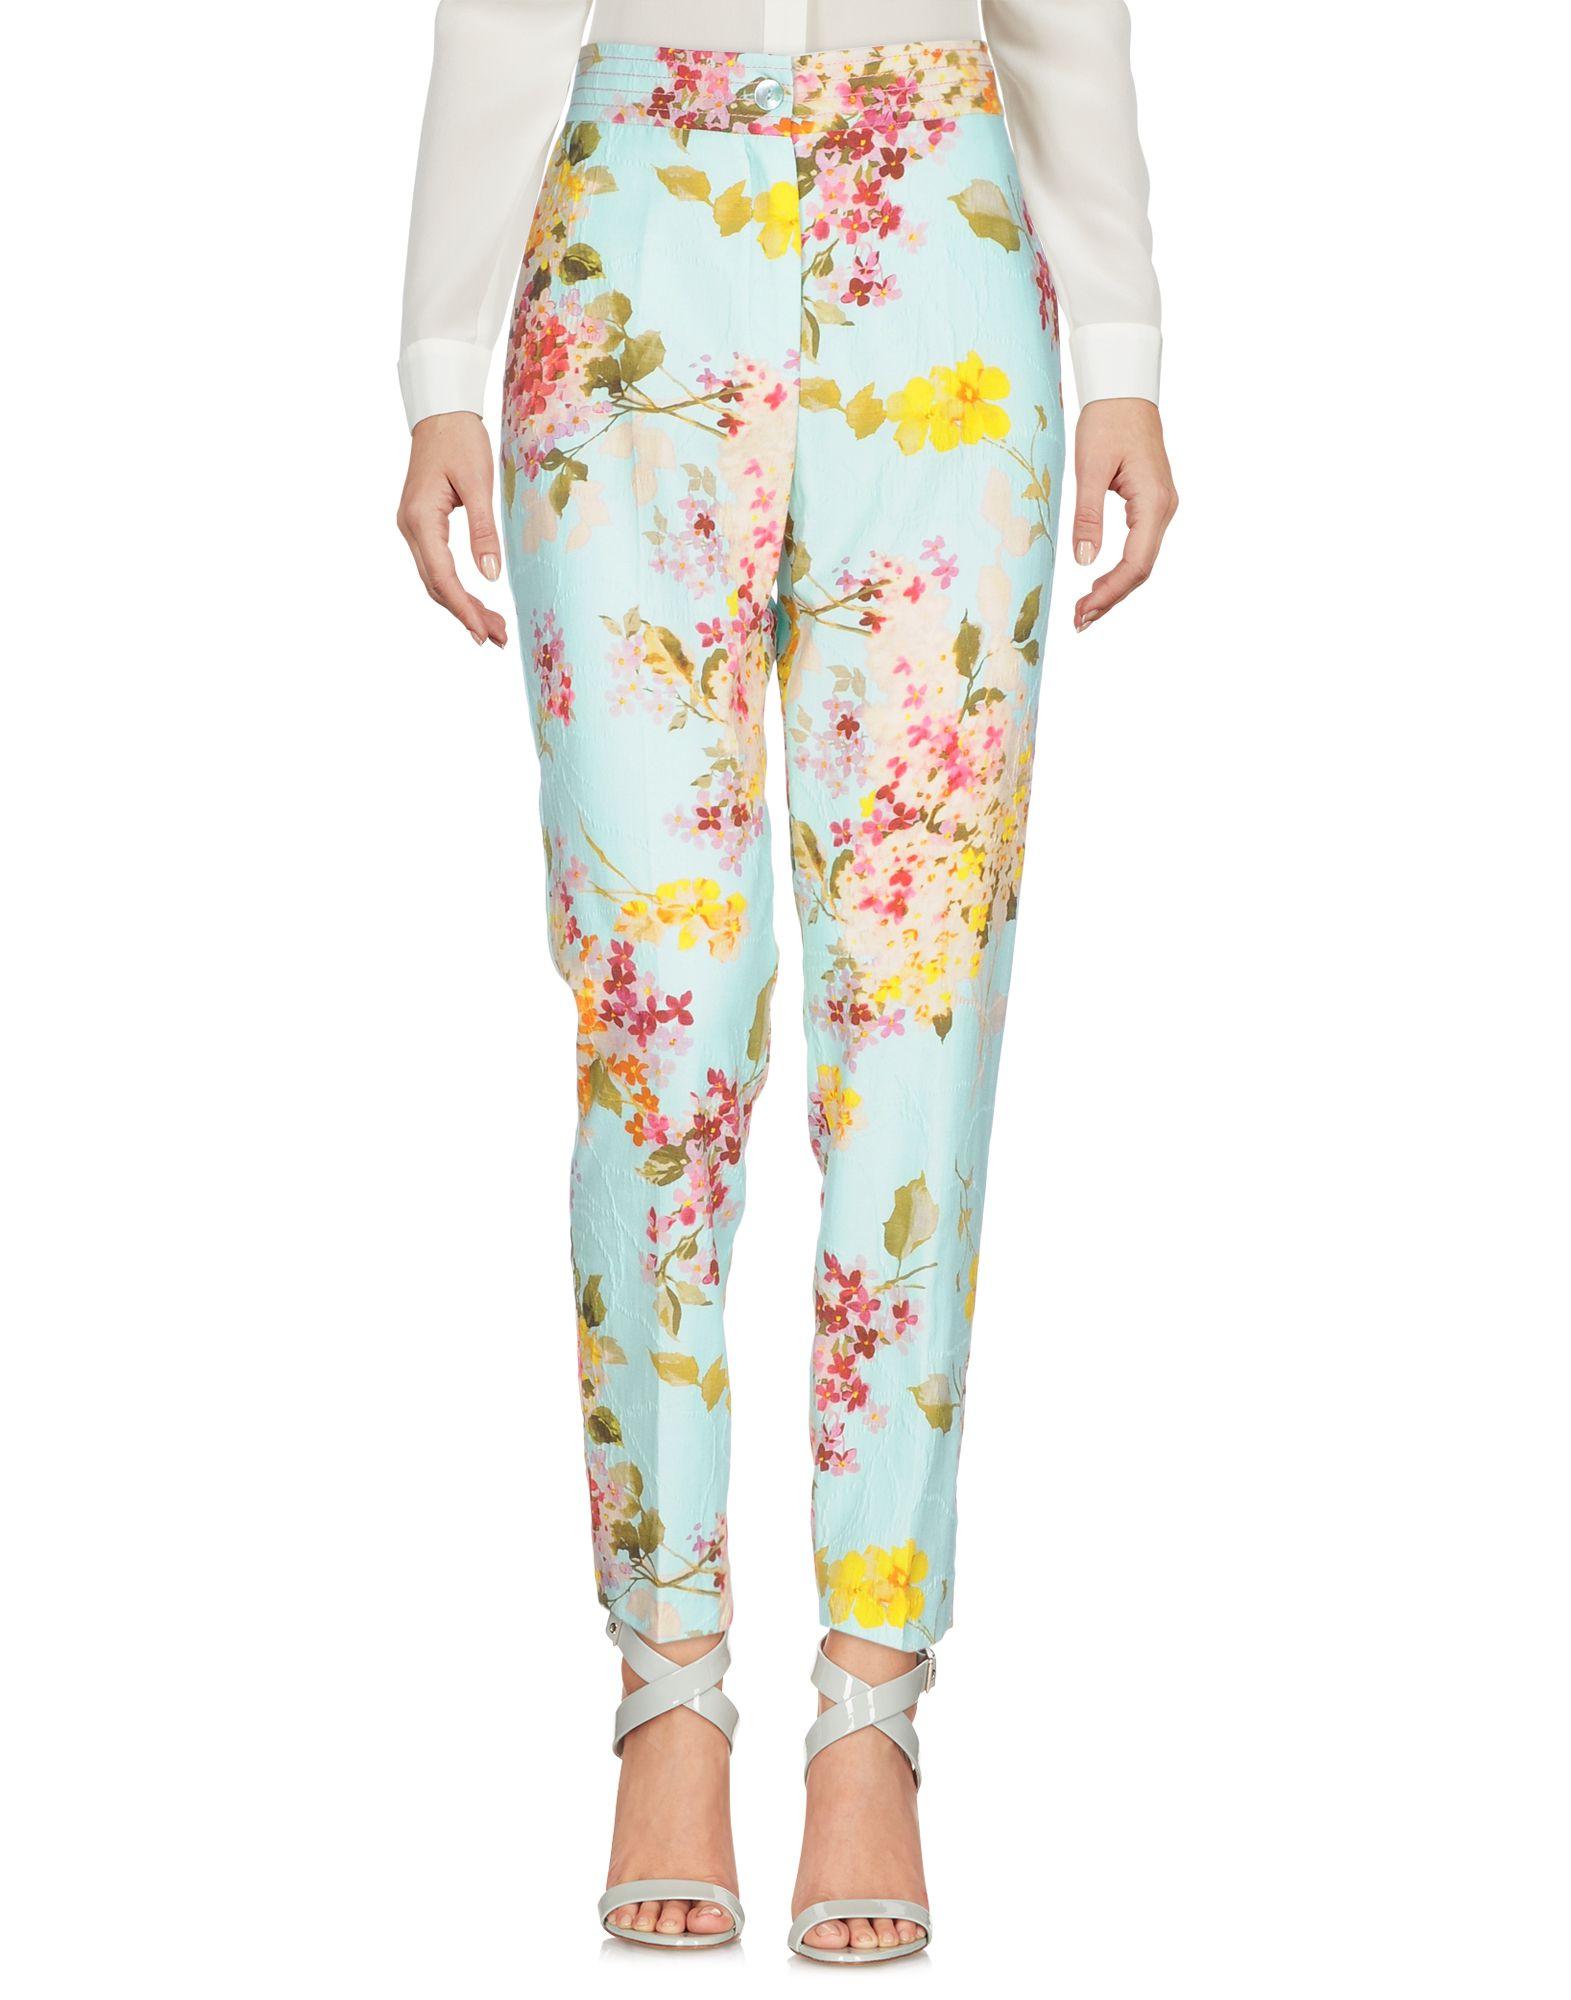 Pantalone Blumarine Donna - Acquista online su zonDUnua